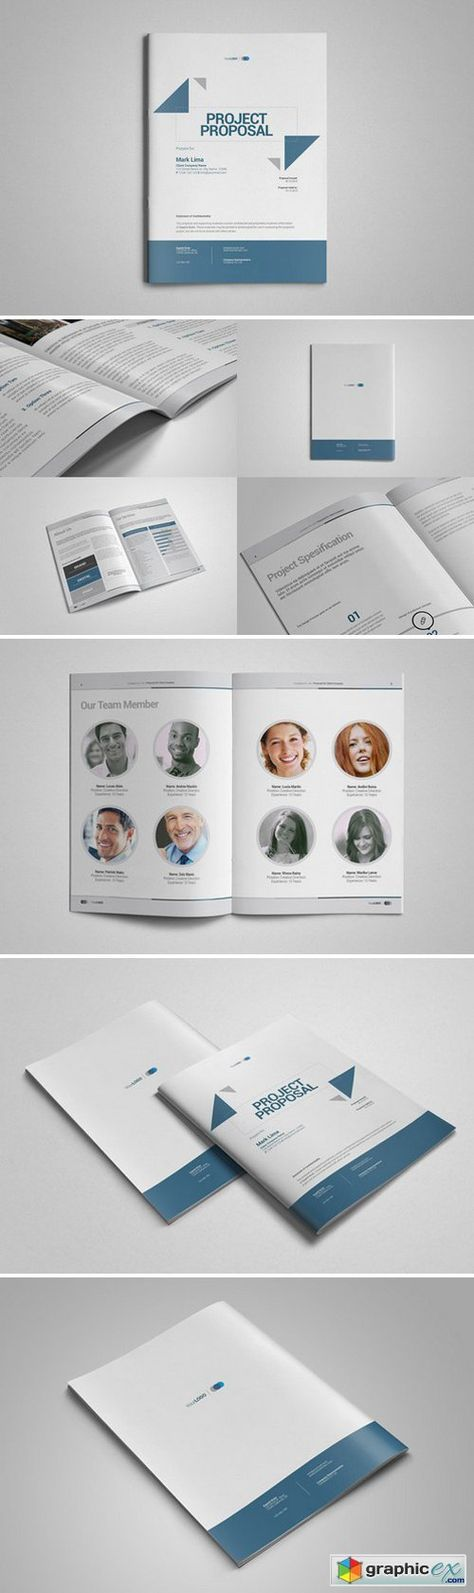 Elite Design ProposalMinimal and Professional Project Proposal - project proposal